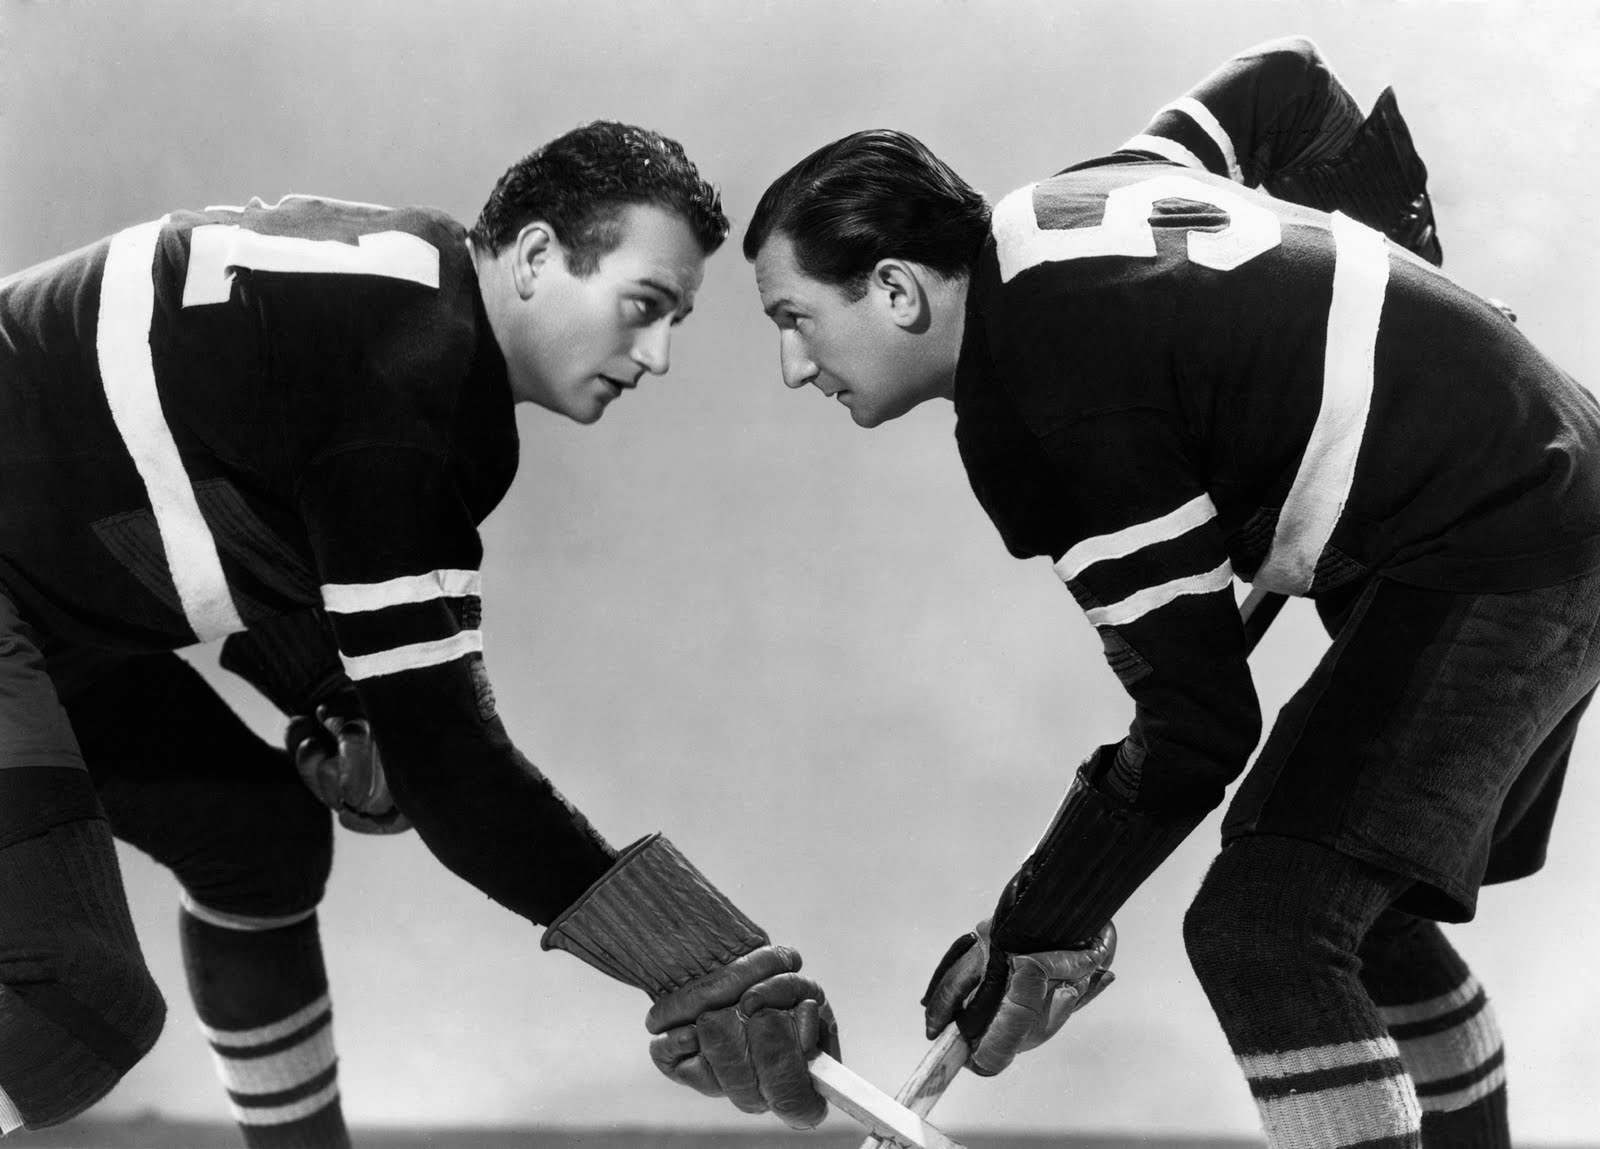 john+wayne+hockey.jpg